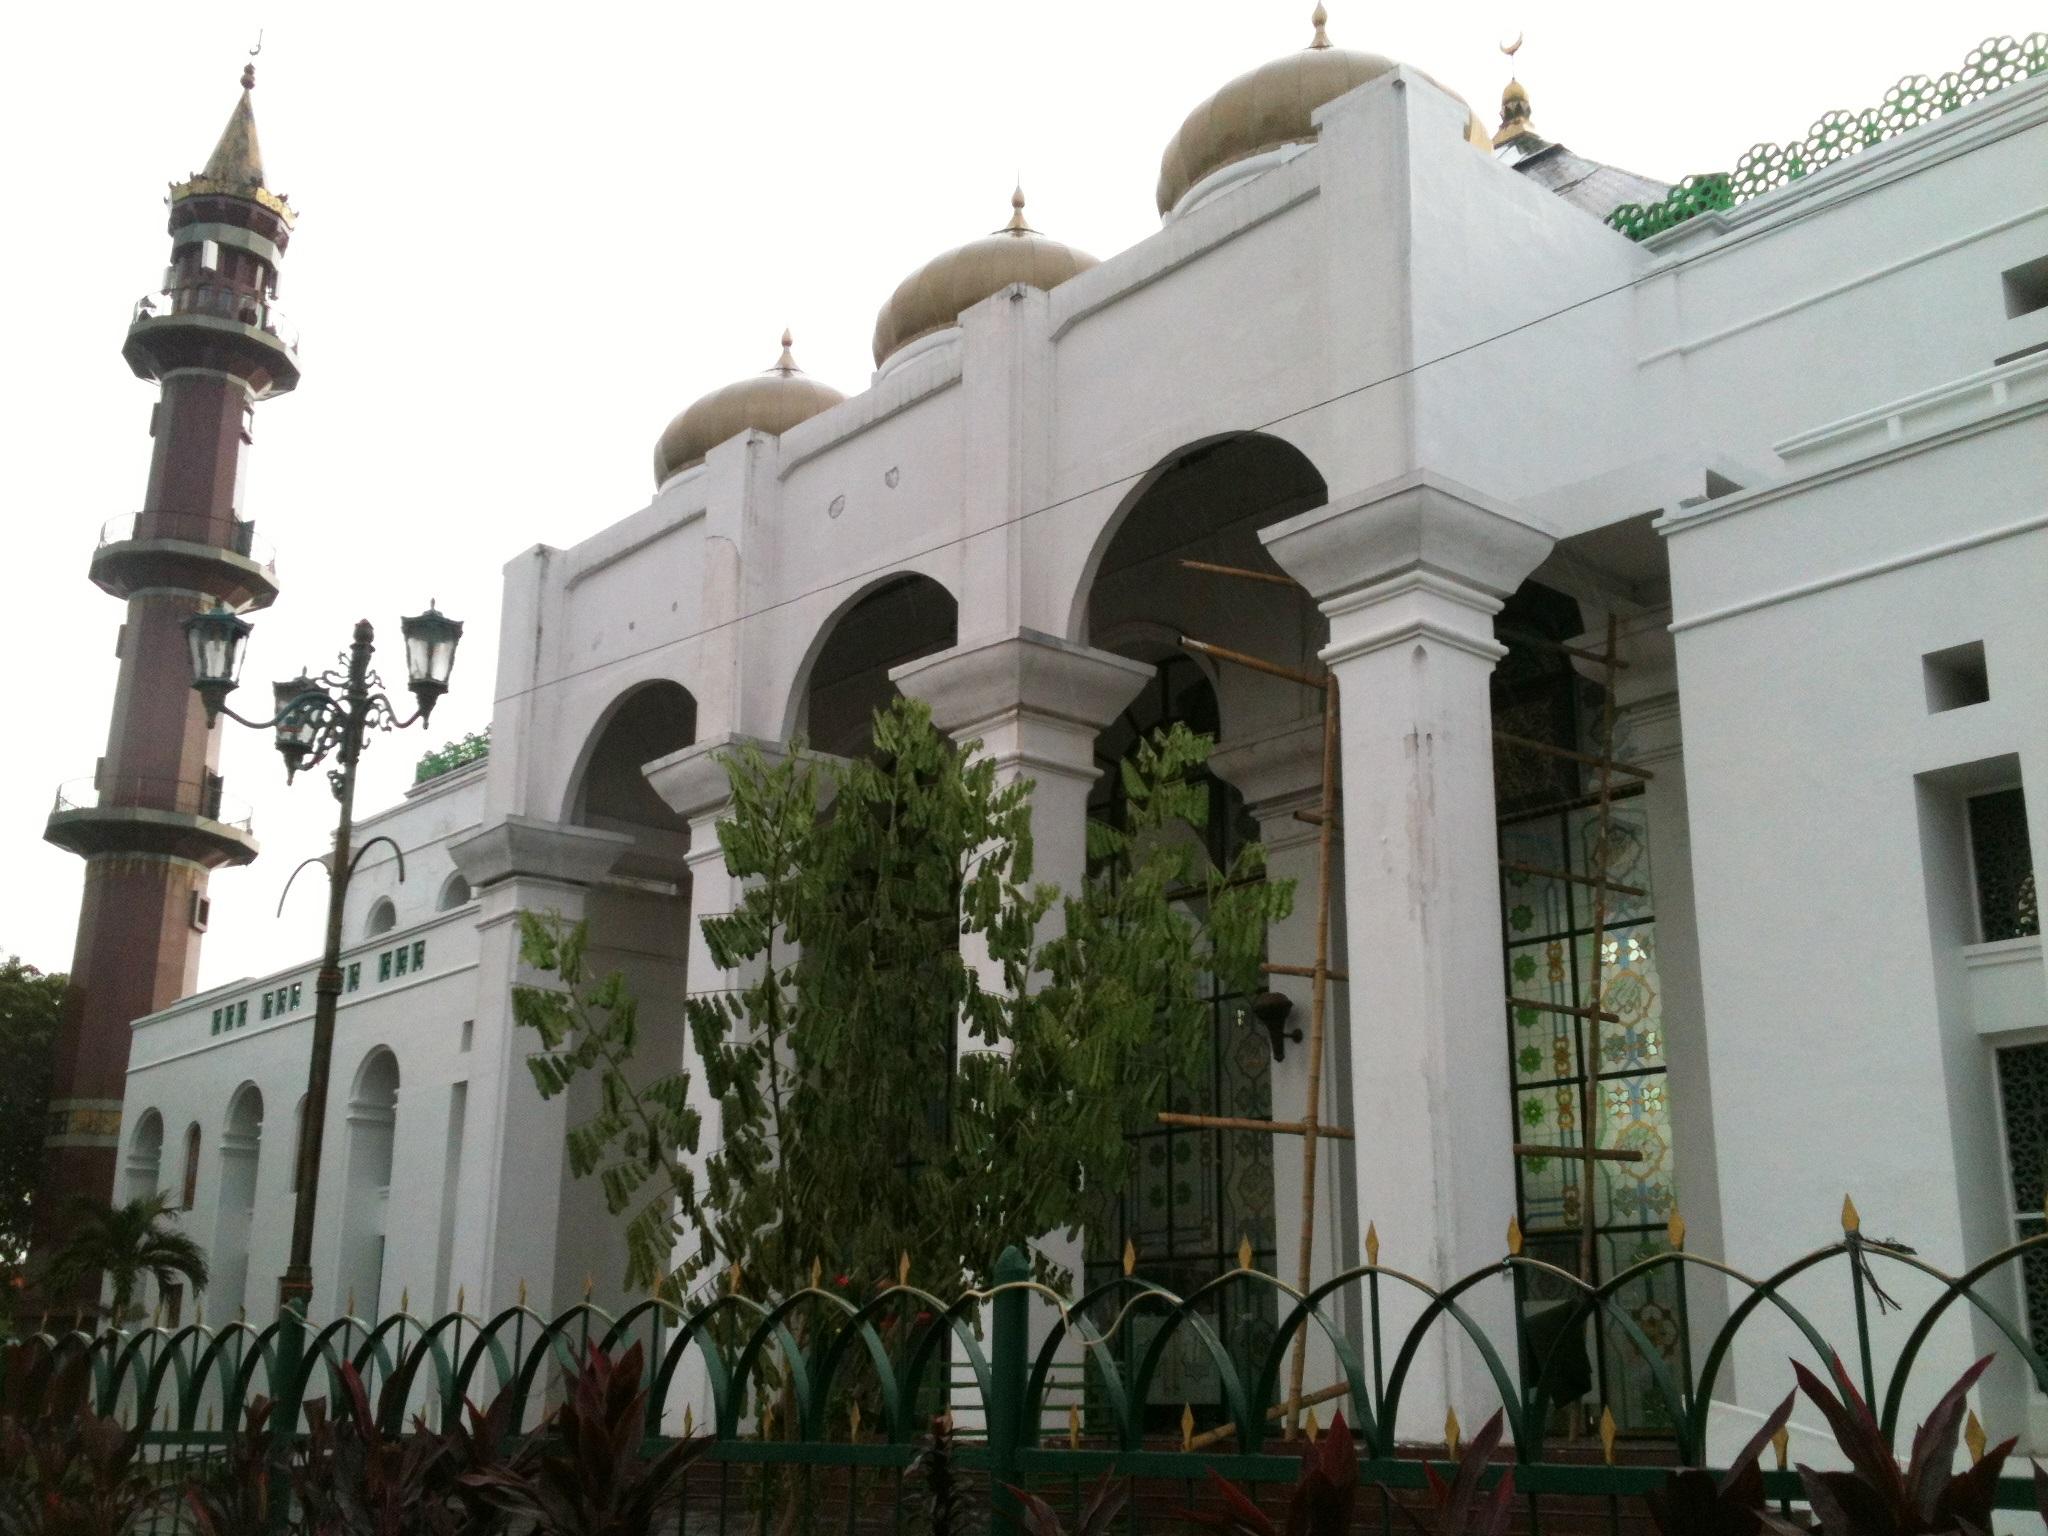 Wisata Religi Masjid Didirikan Abad 18 Oleh Sultan Mahmud Badaruddin